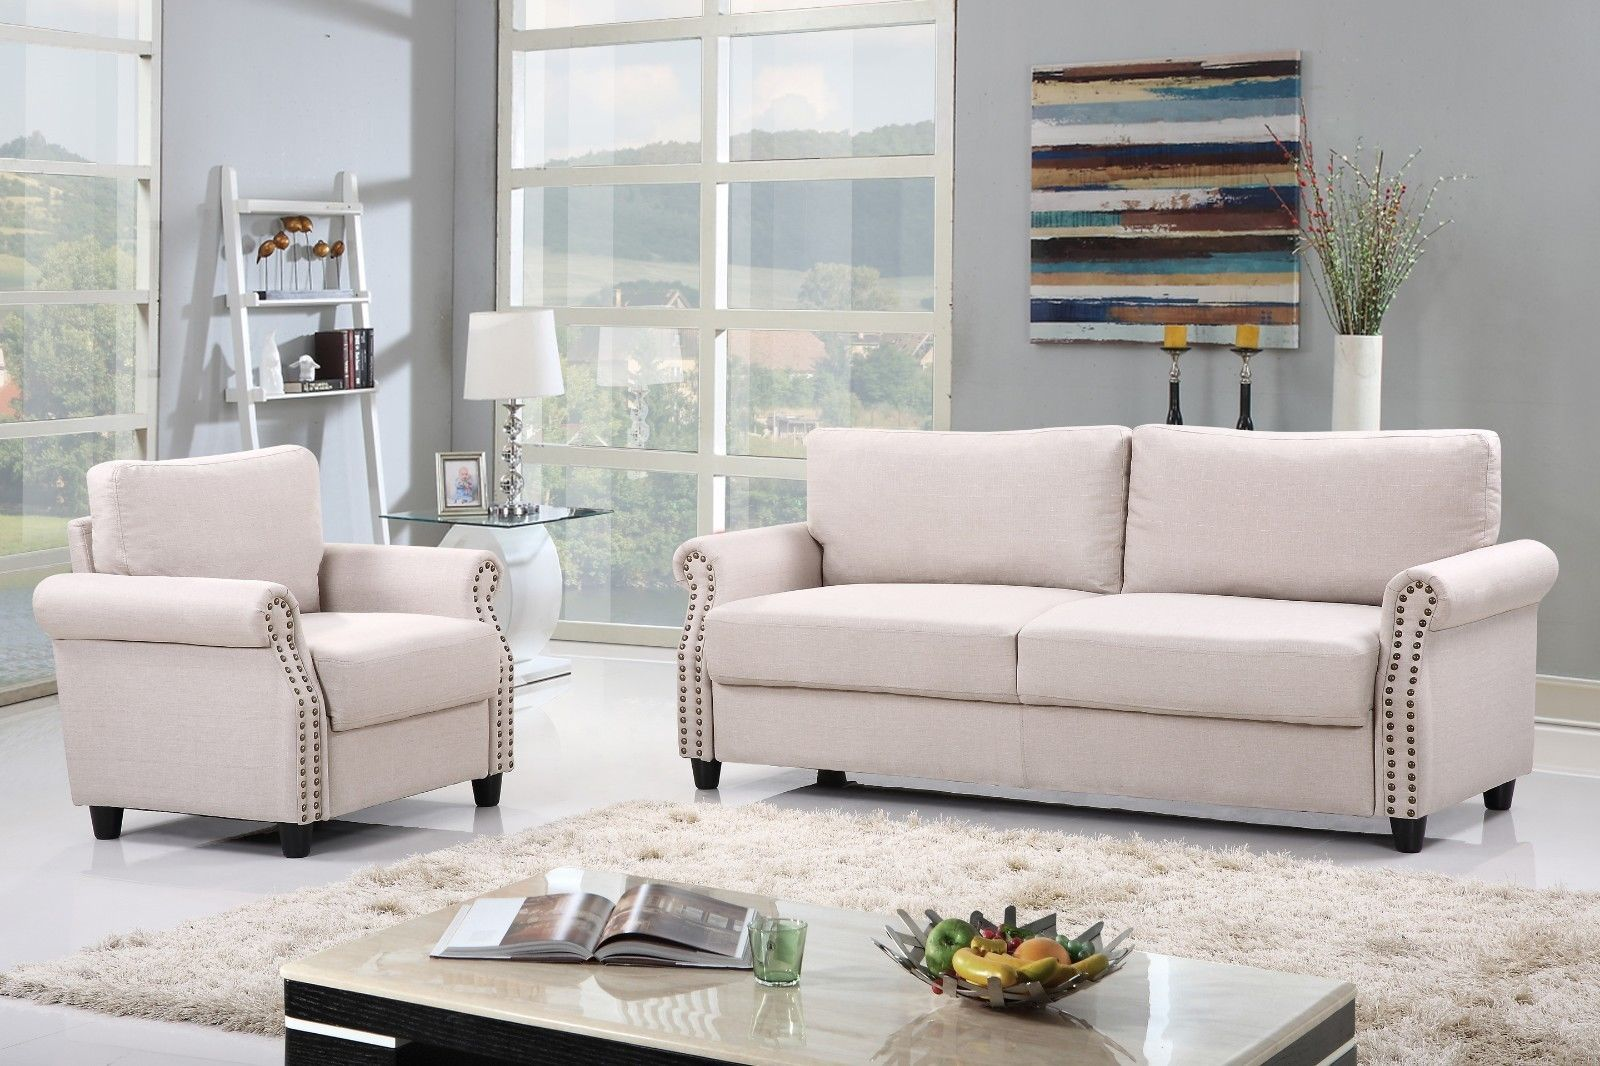 2 Piece Living Room Sofa & Armchair Furniture Set w/ Nailhead Trim ...